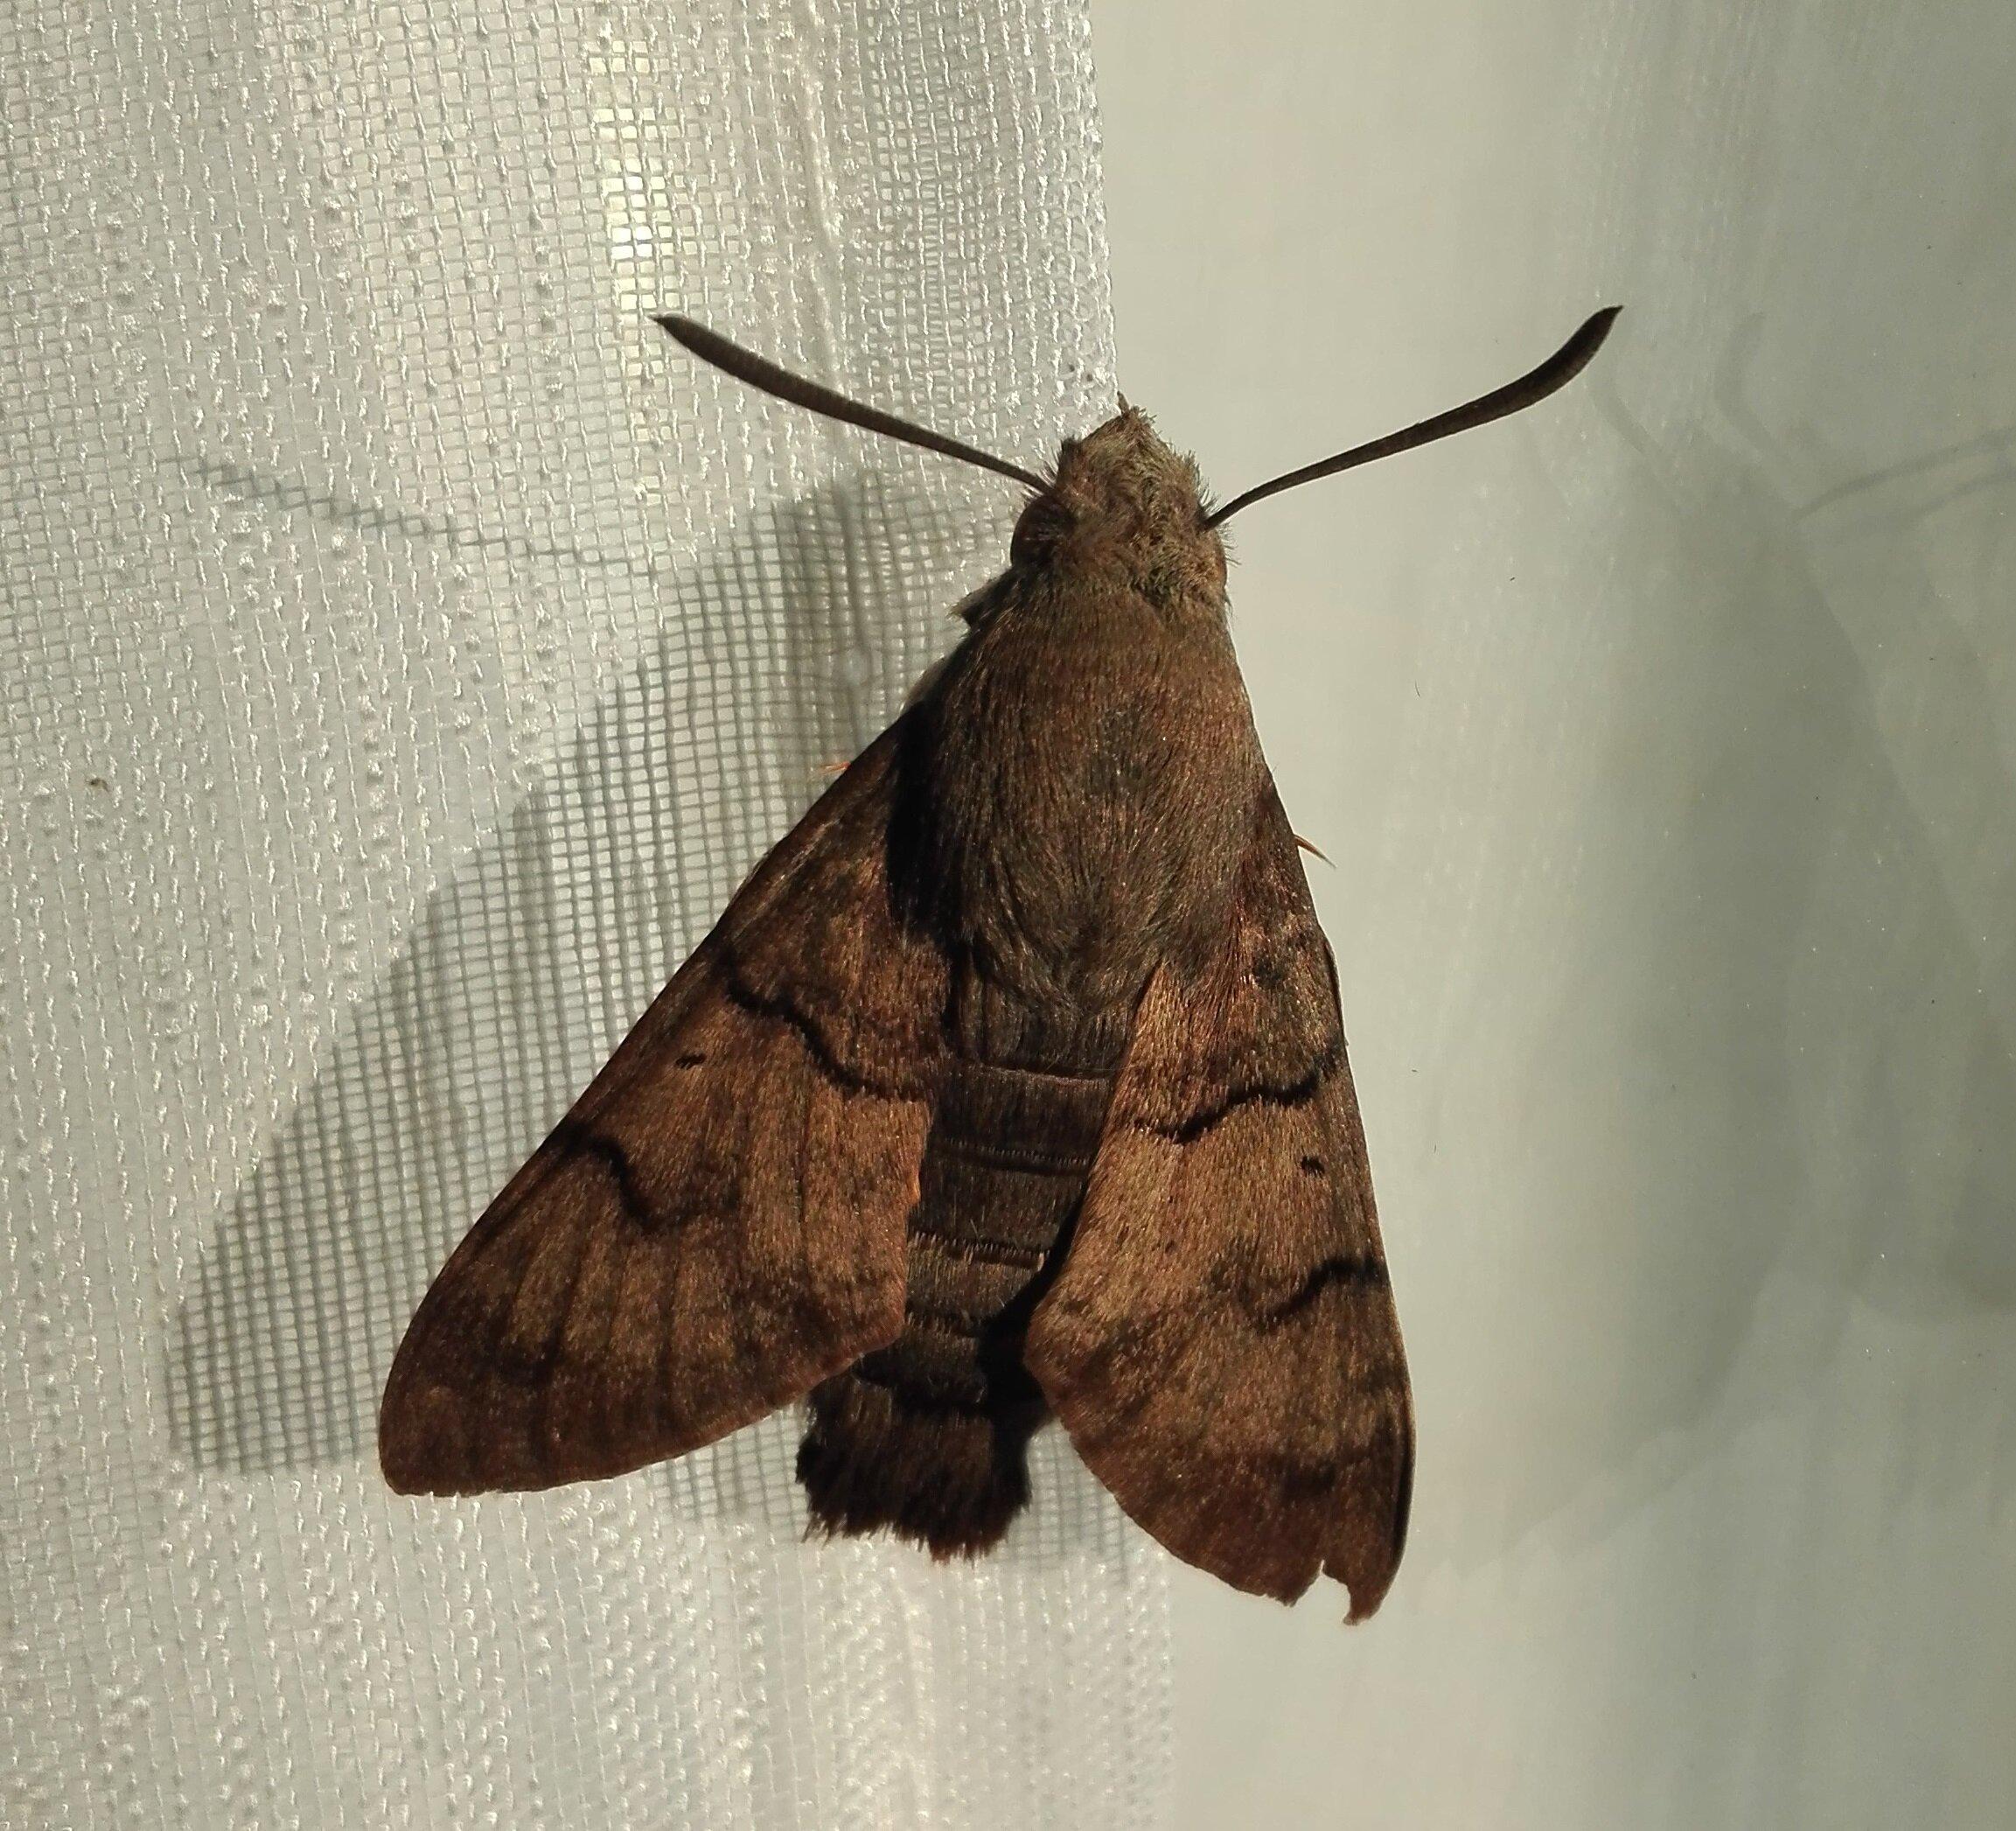 Hummingbird Hawk Moth (Macroglossum stellatarum)